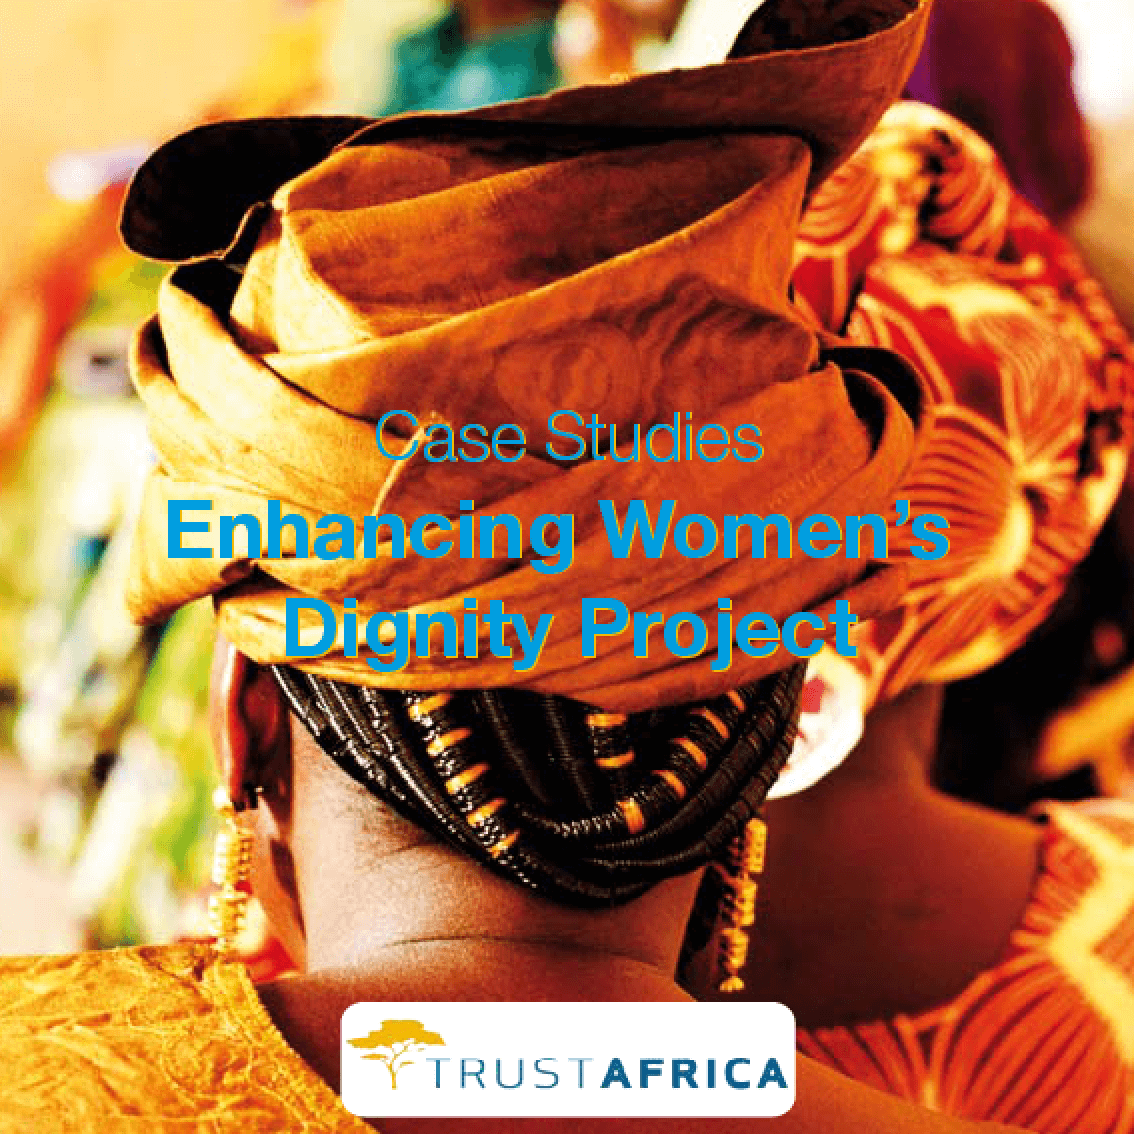 Case Studies Enhancing Women's Dignity Project